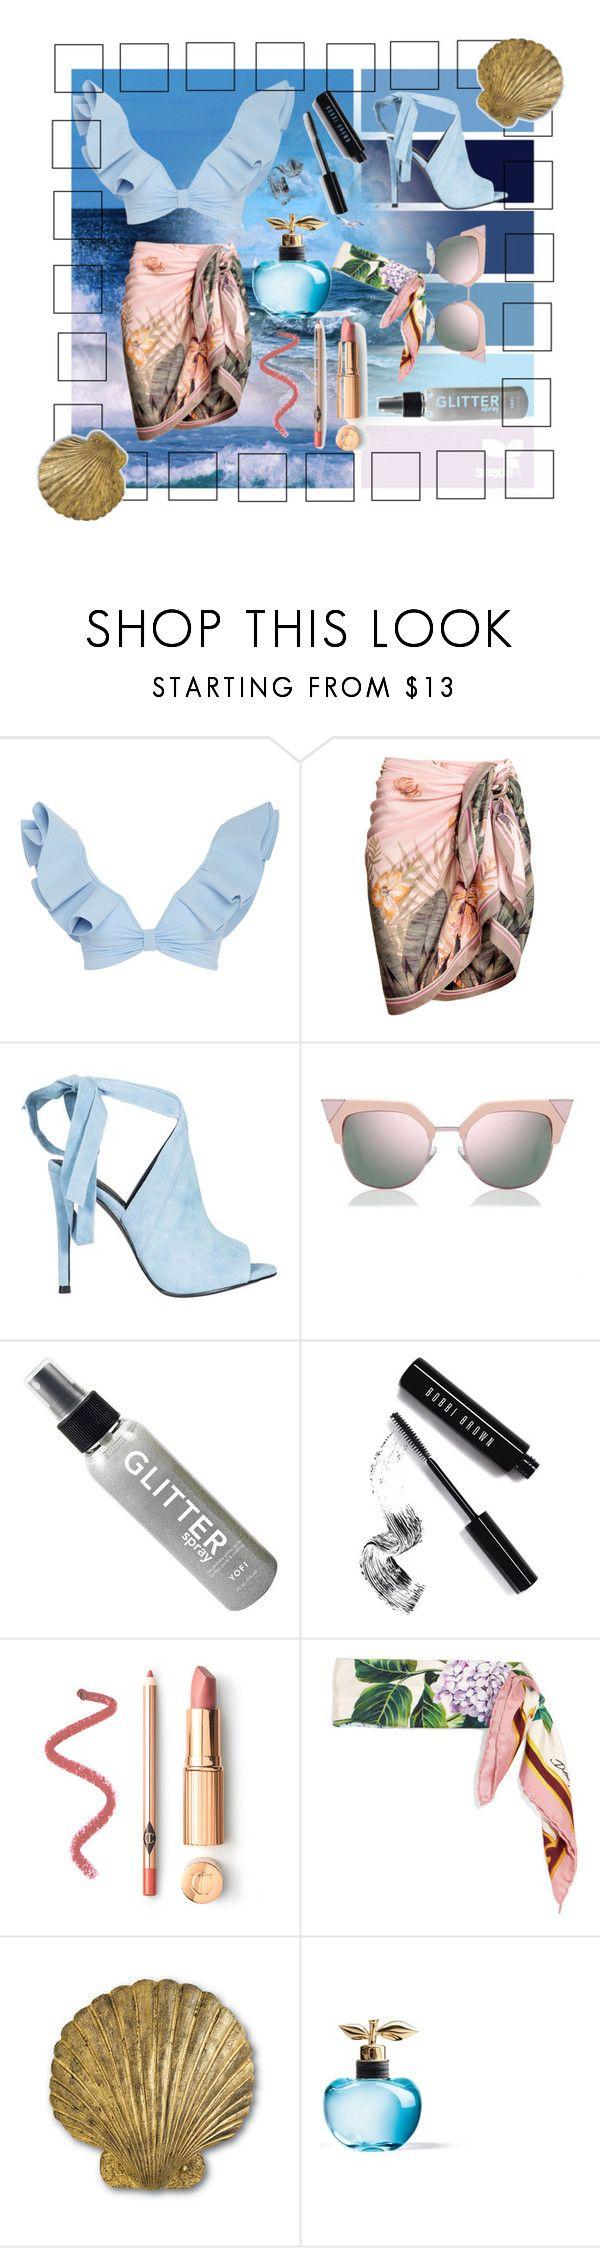 """Beach Brunch"" by spookie1 ❤ liked on Polyvore featuring Johanna Ortiz, Kendall + Kylie, Fendi, Bobbi Brown Cosmetics, Dolce&Gabbana and Nina Ricci"